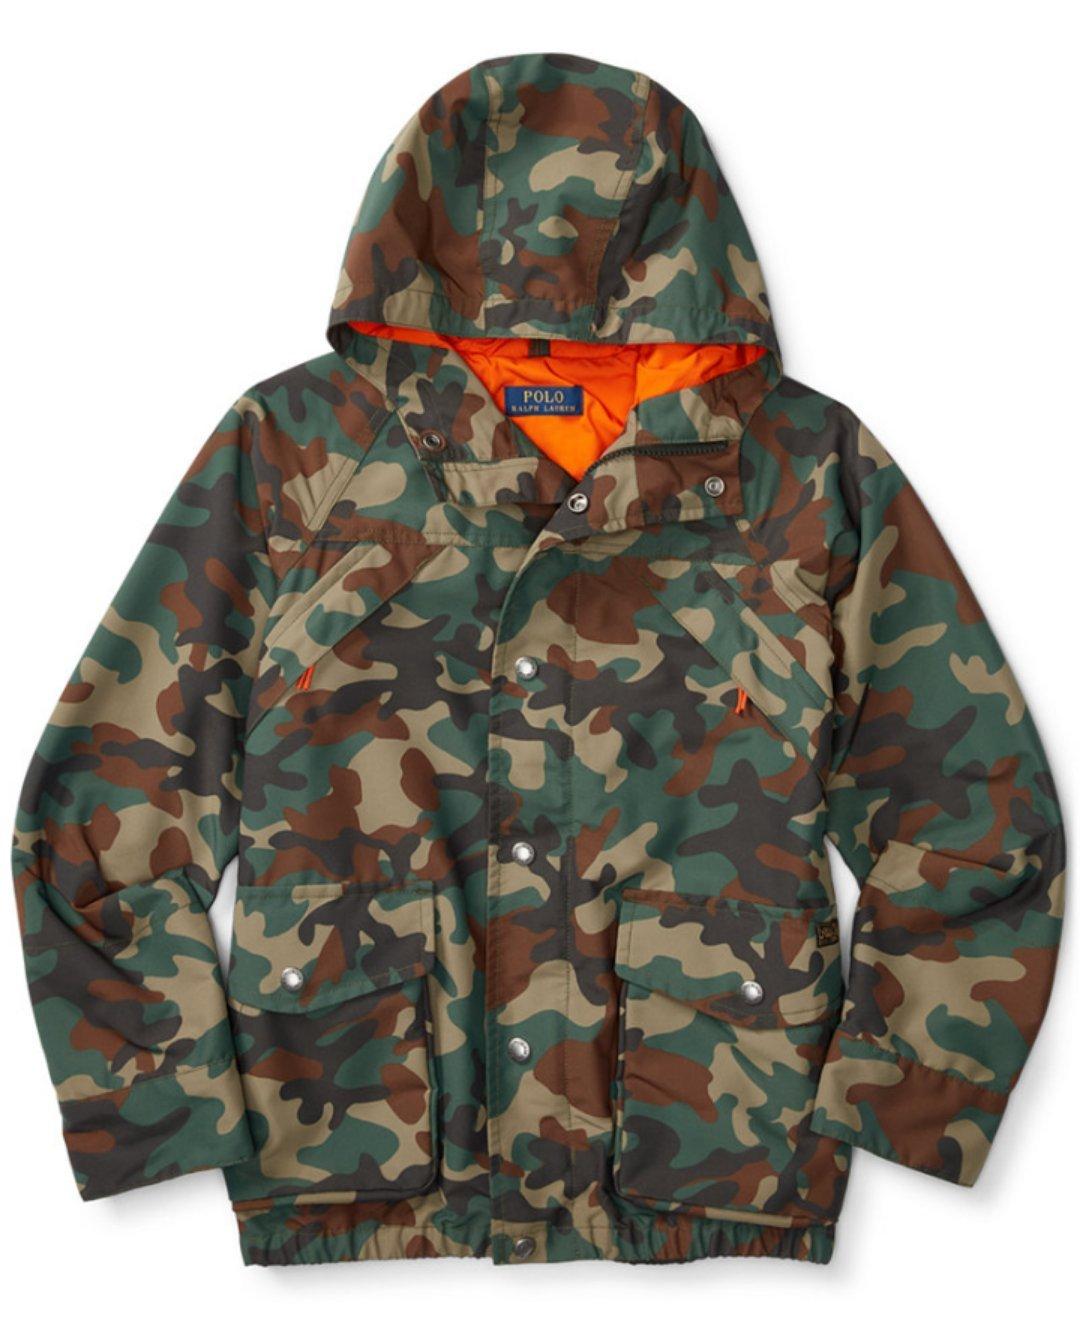 48cf7e308e039 Amazon.com: Ralph Lauren Polo Boys Camouflage Camo Faille Windbreaker  Hooded Jacket (Medium 10-12): Baby